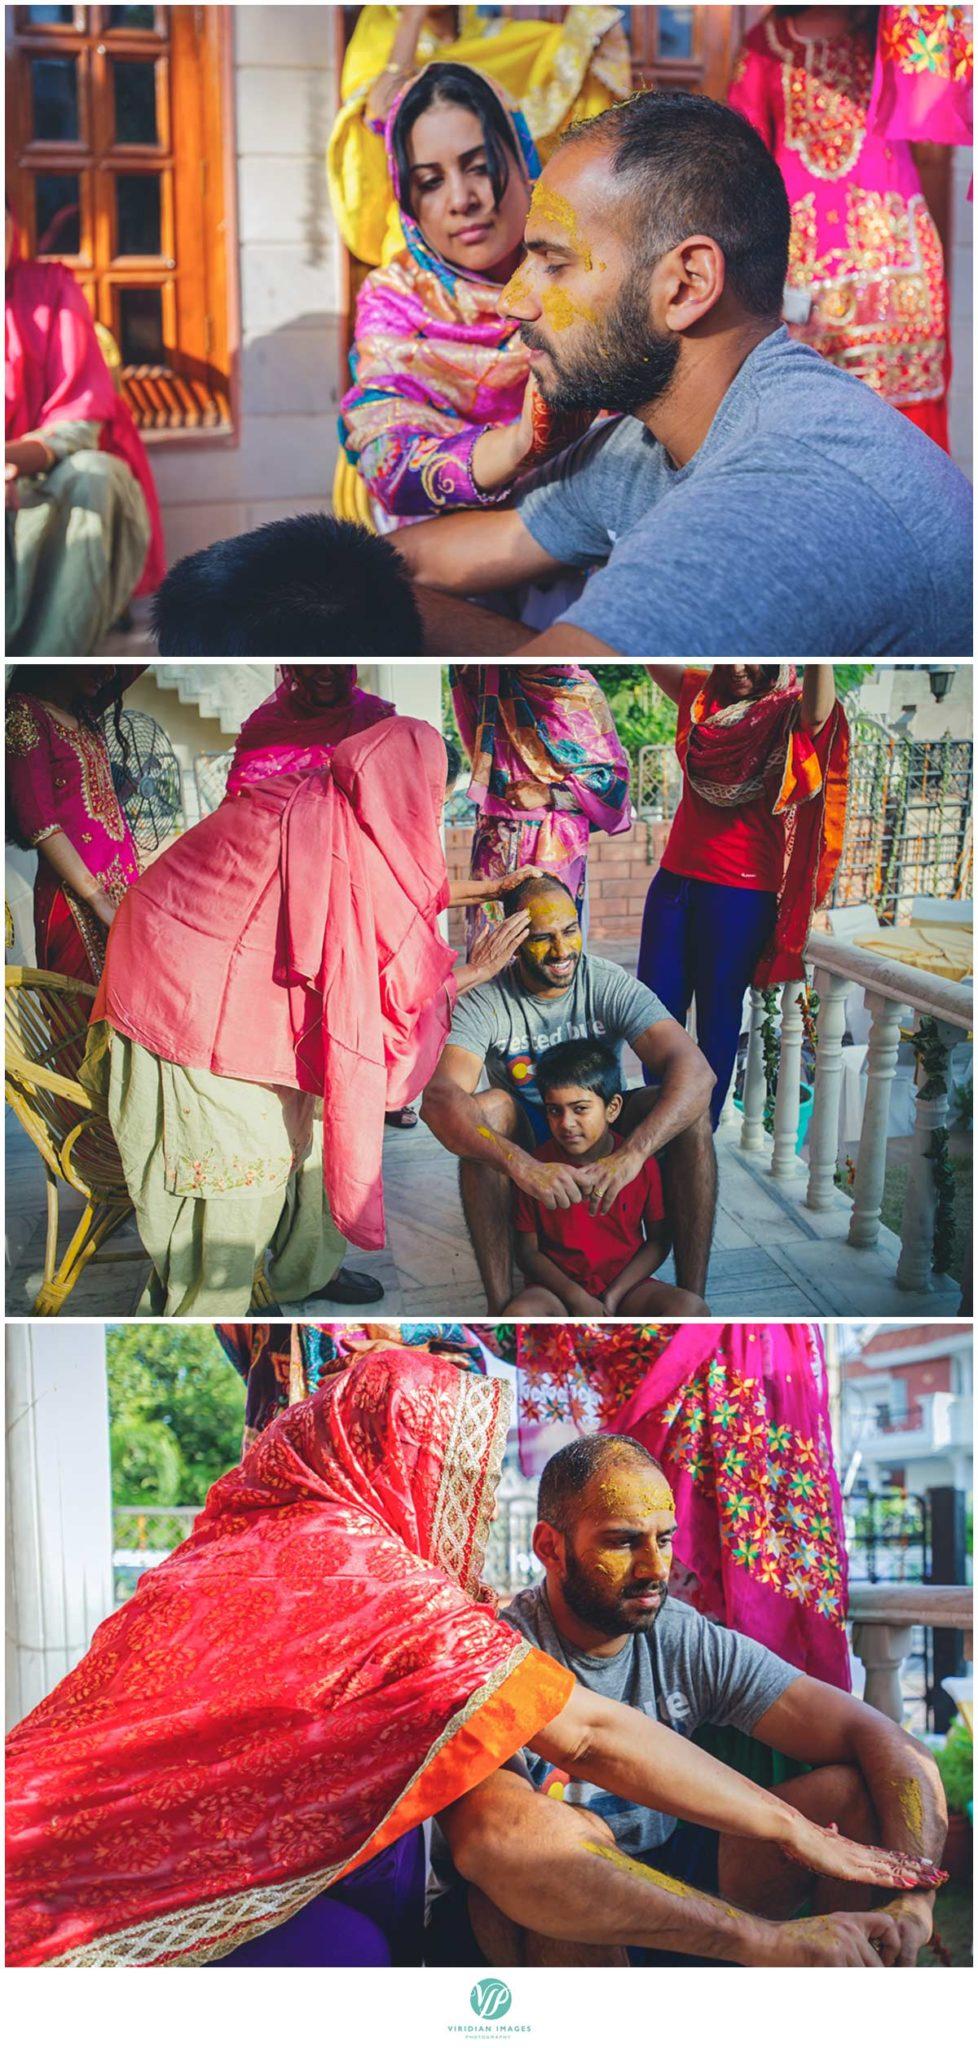 India_Chandigarh_Wedding_Viridian_Images_Photography_poto_6